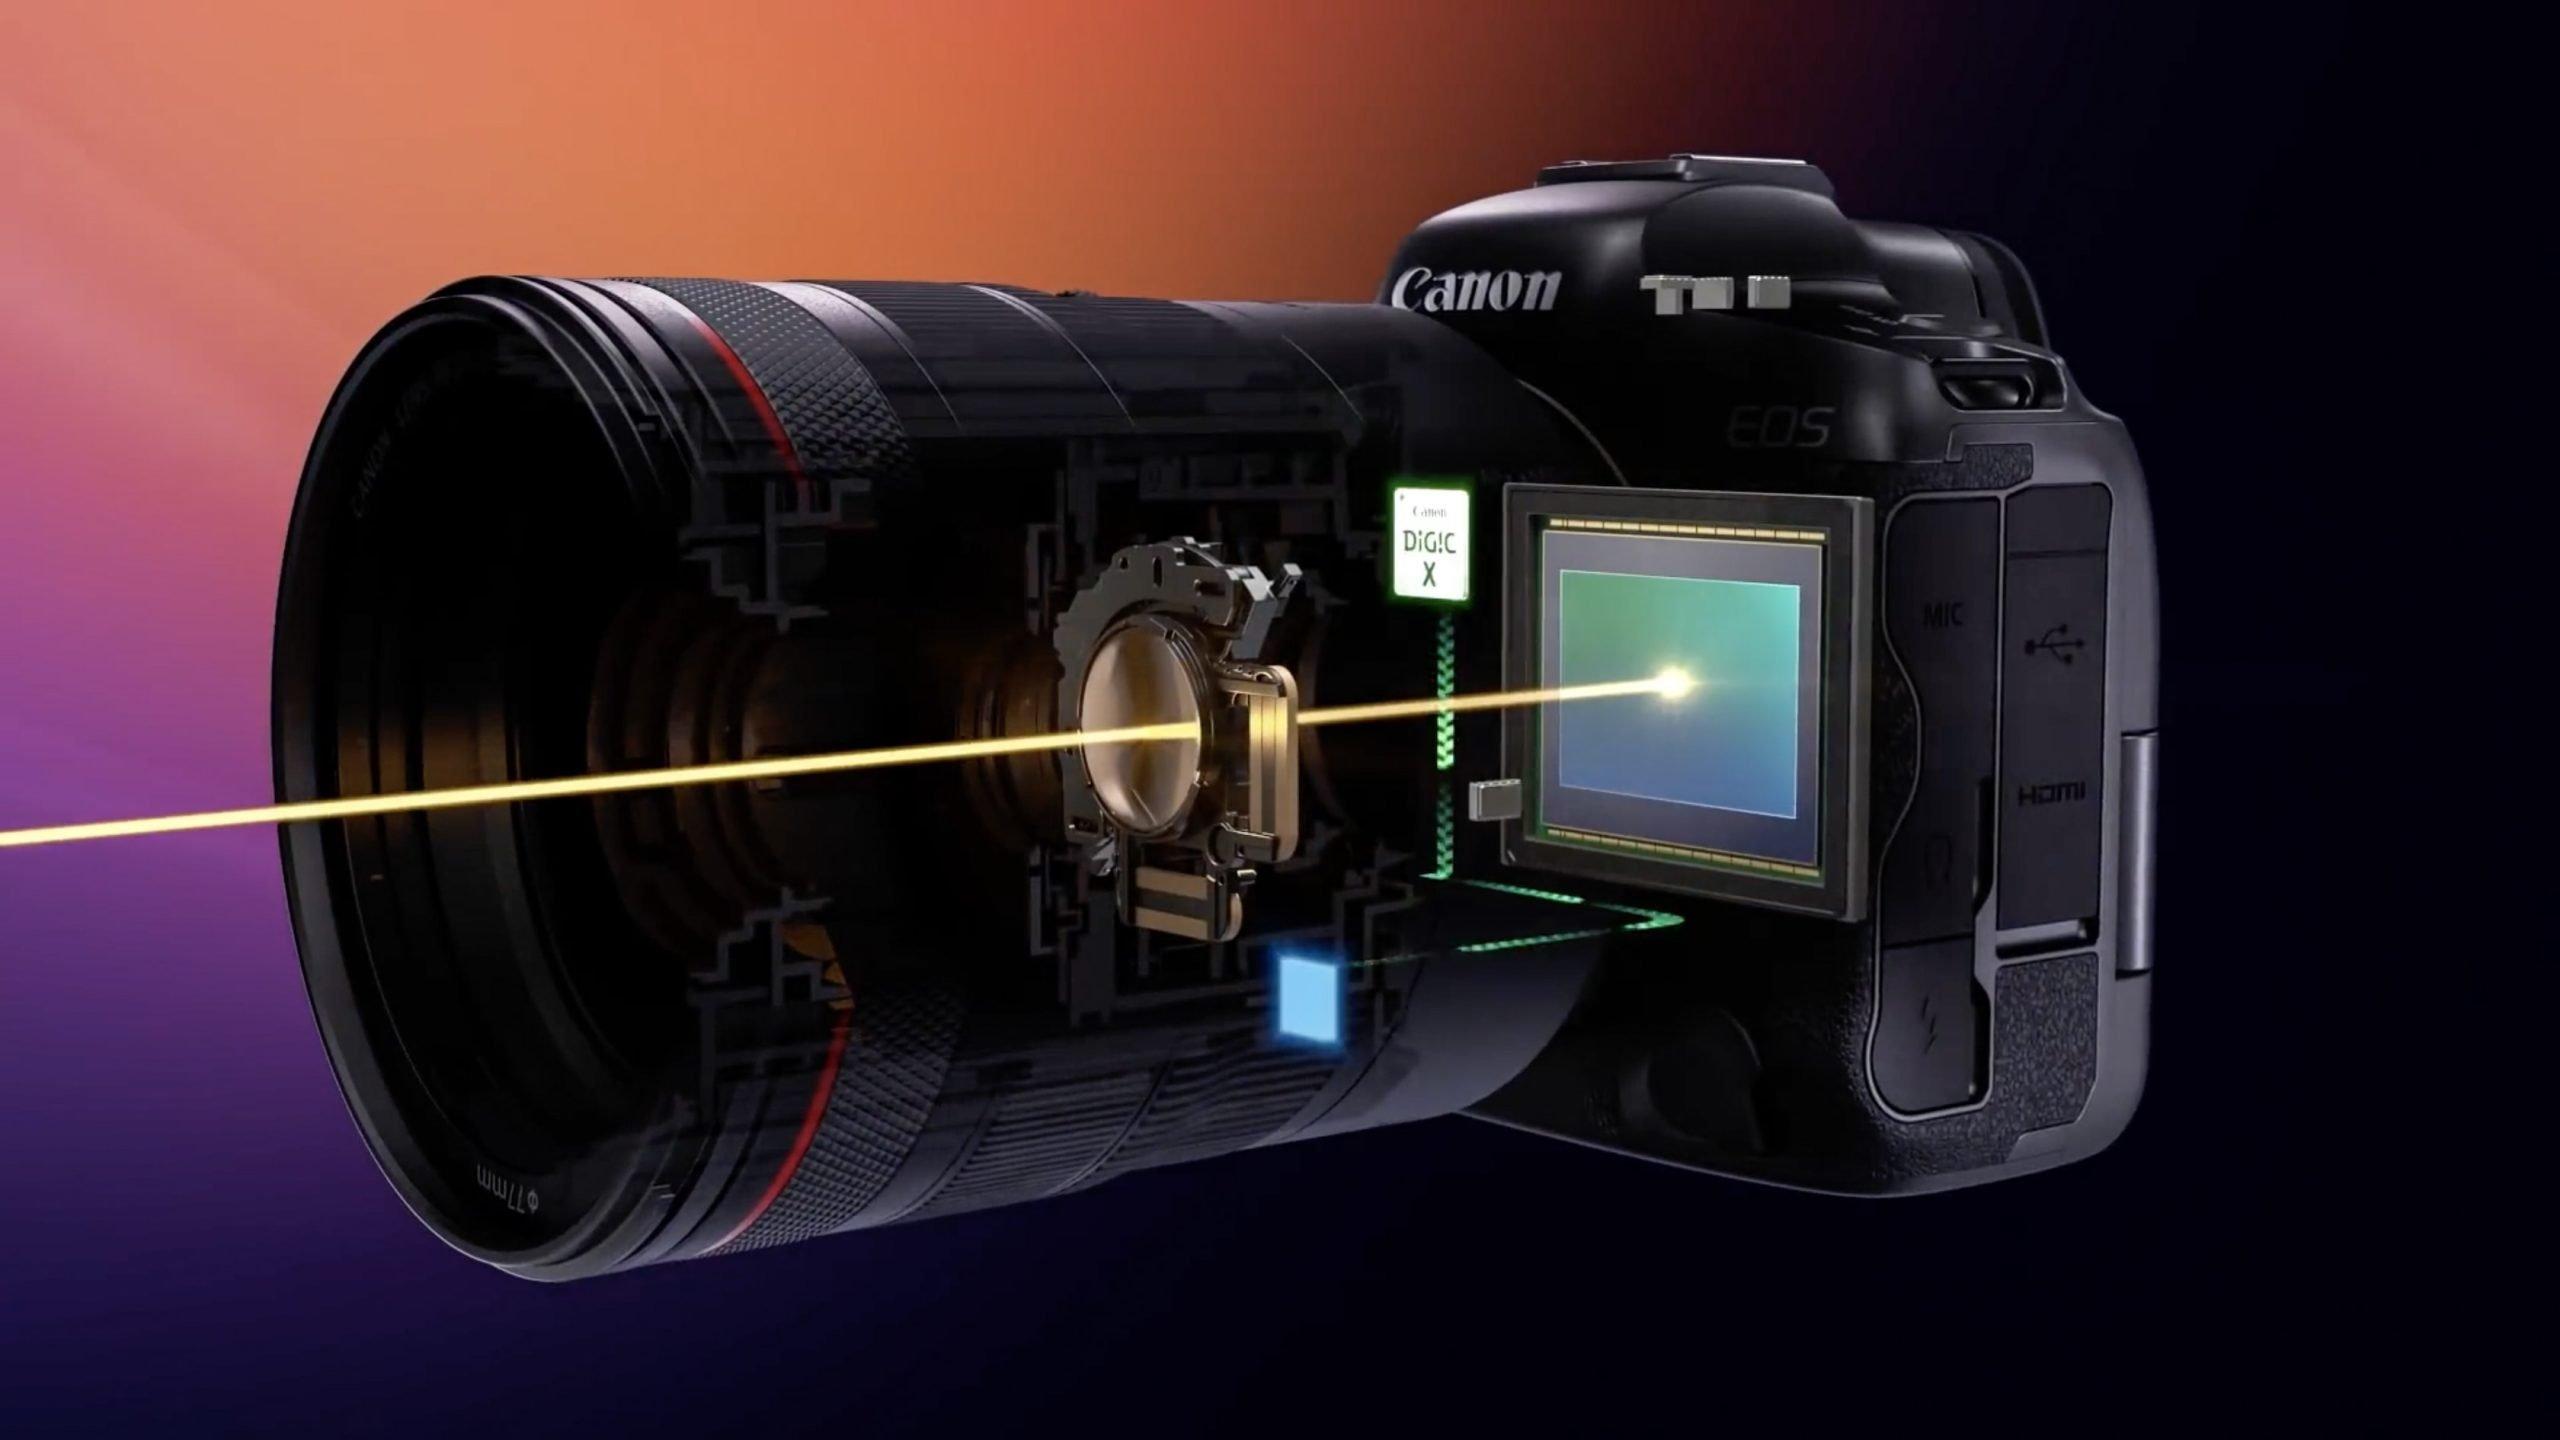 Canon EOS M50 Mark II rumors